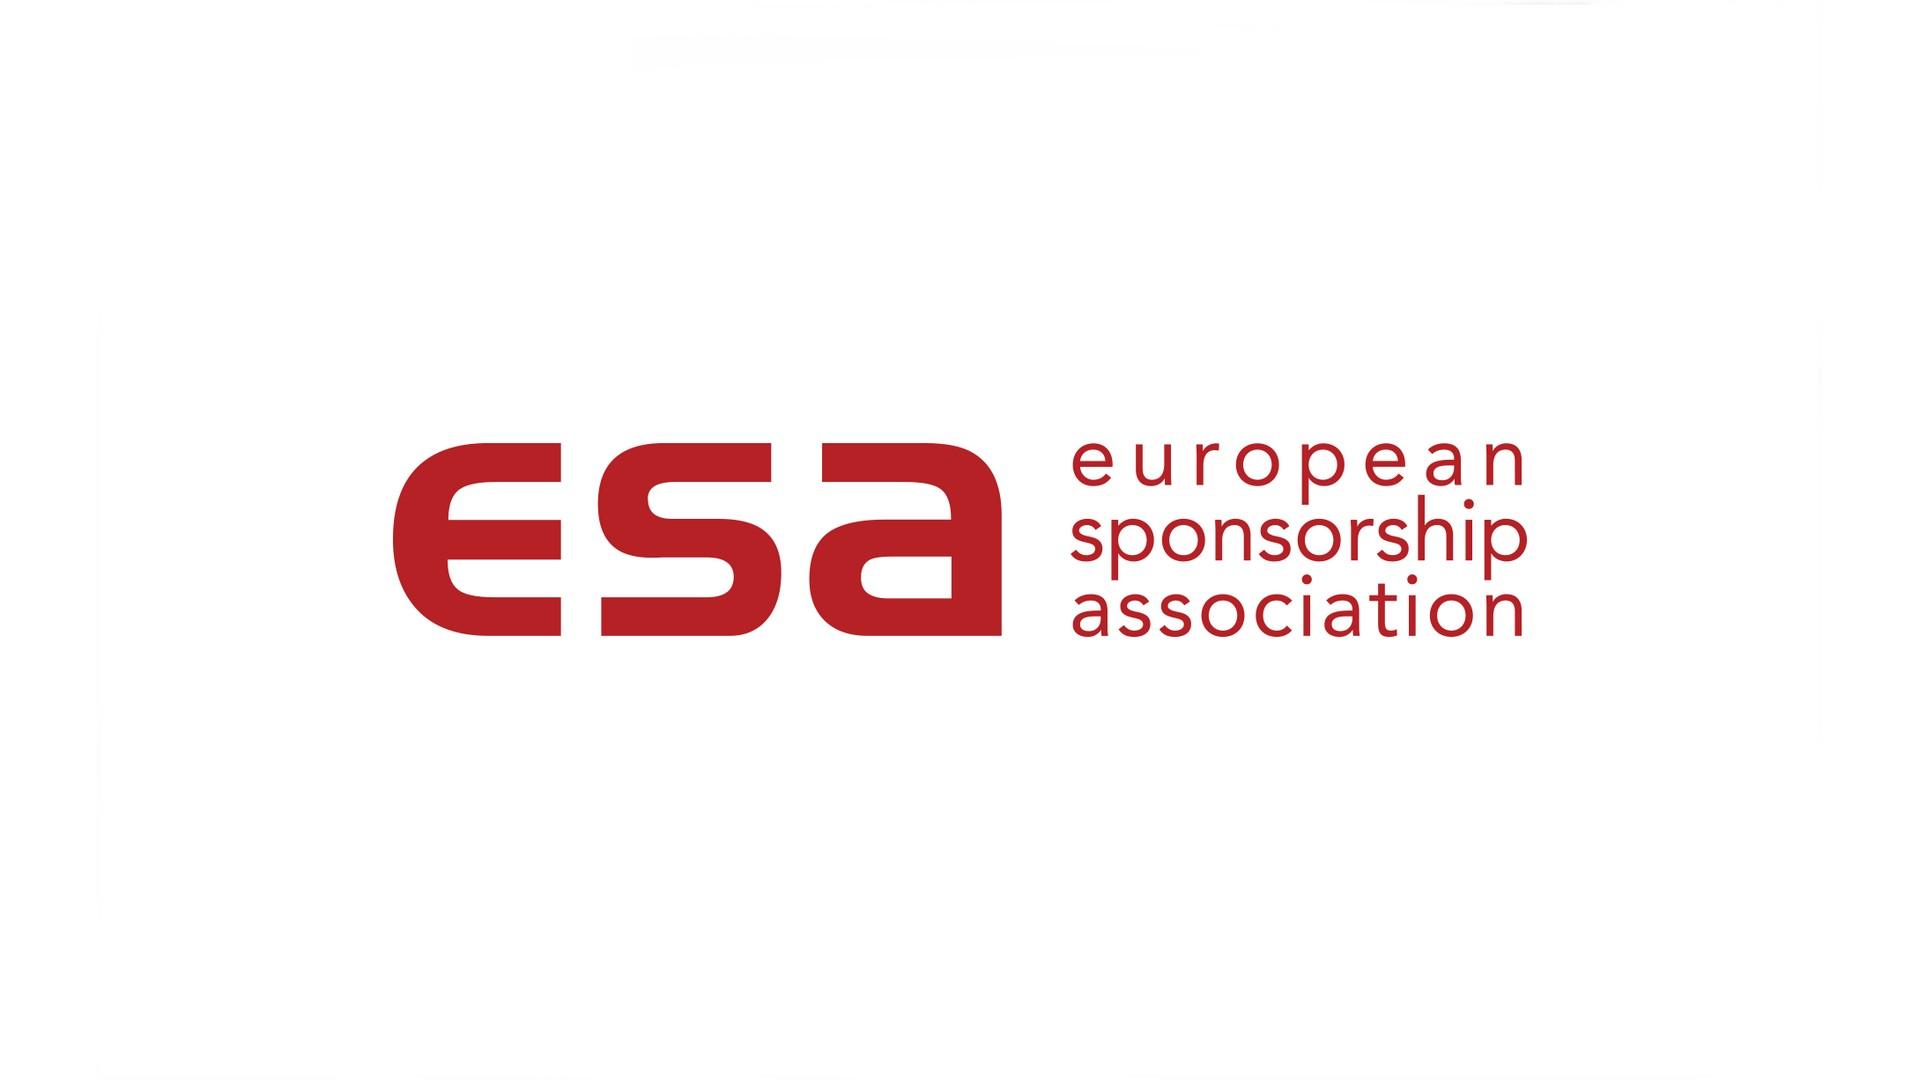 ESA European Sponsorship Association (2) Logo